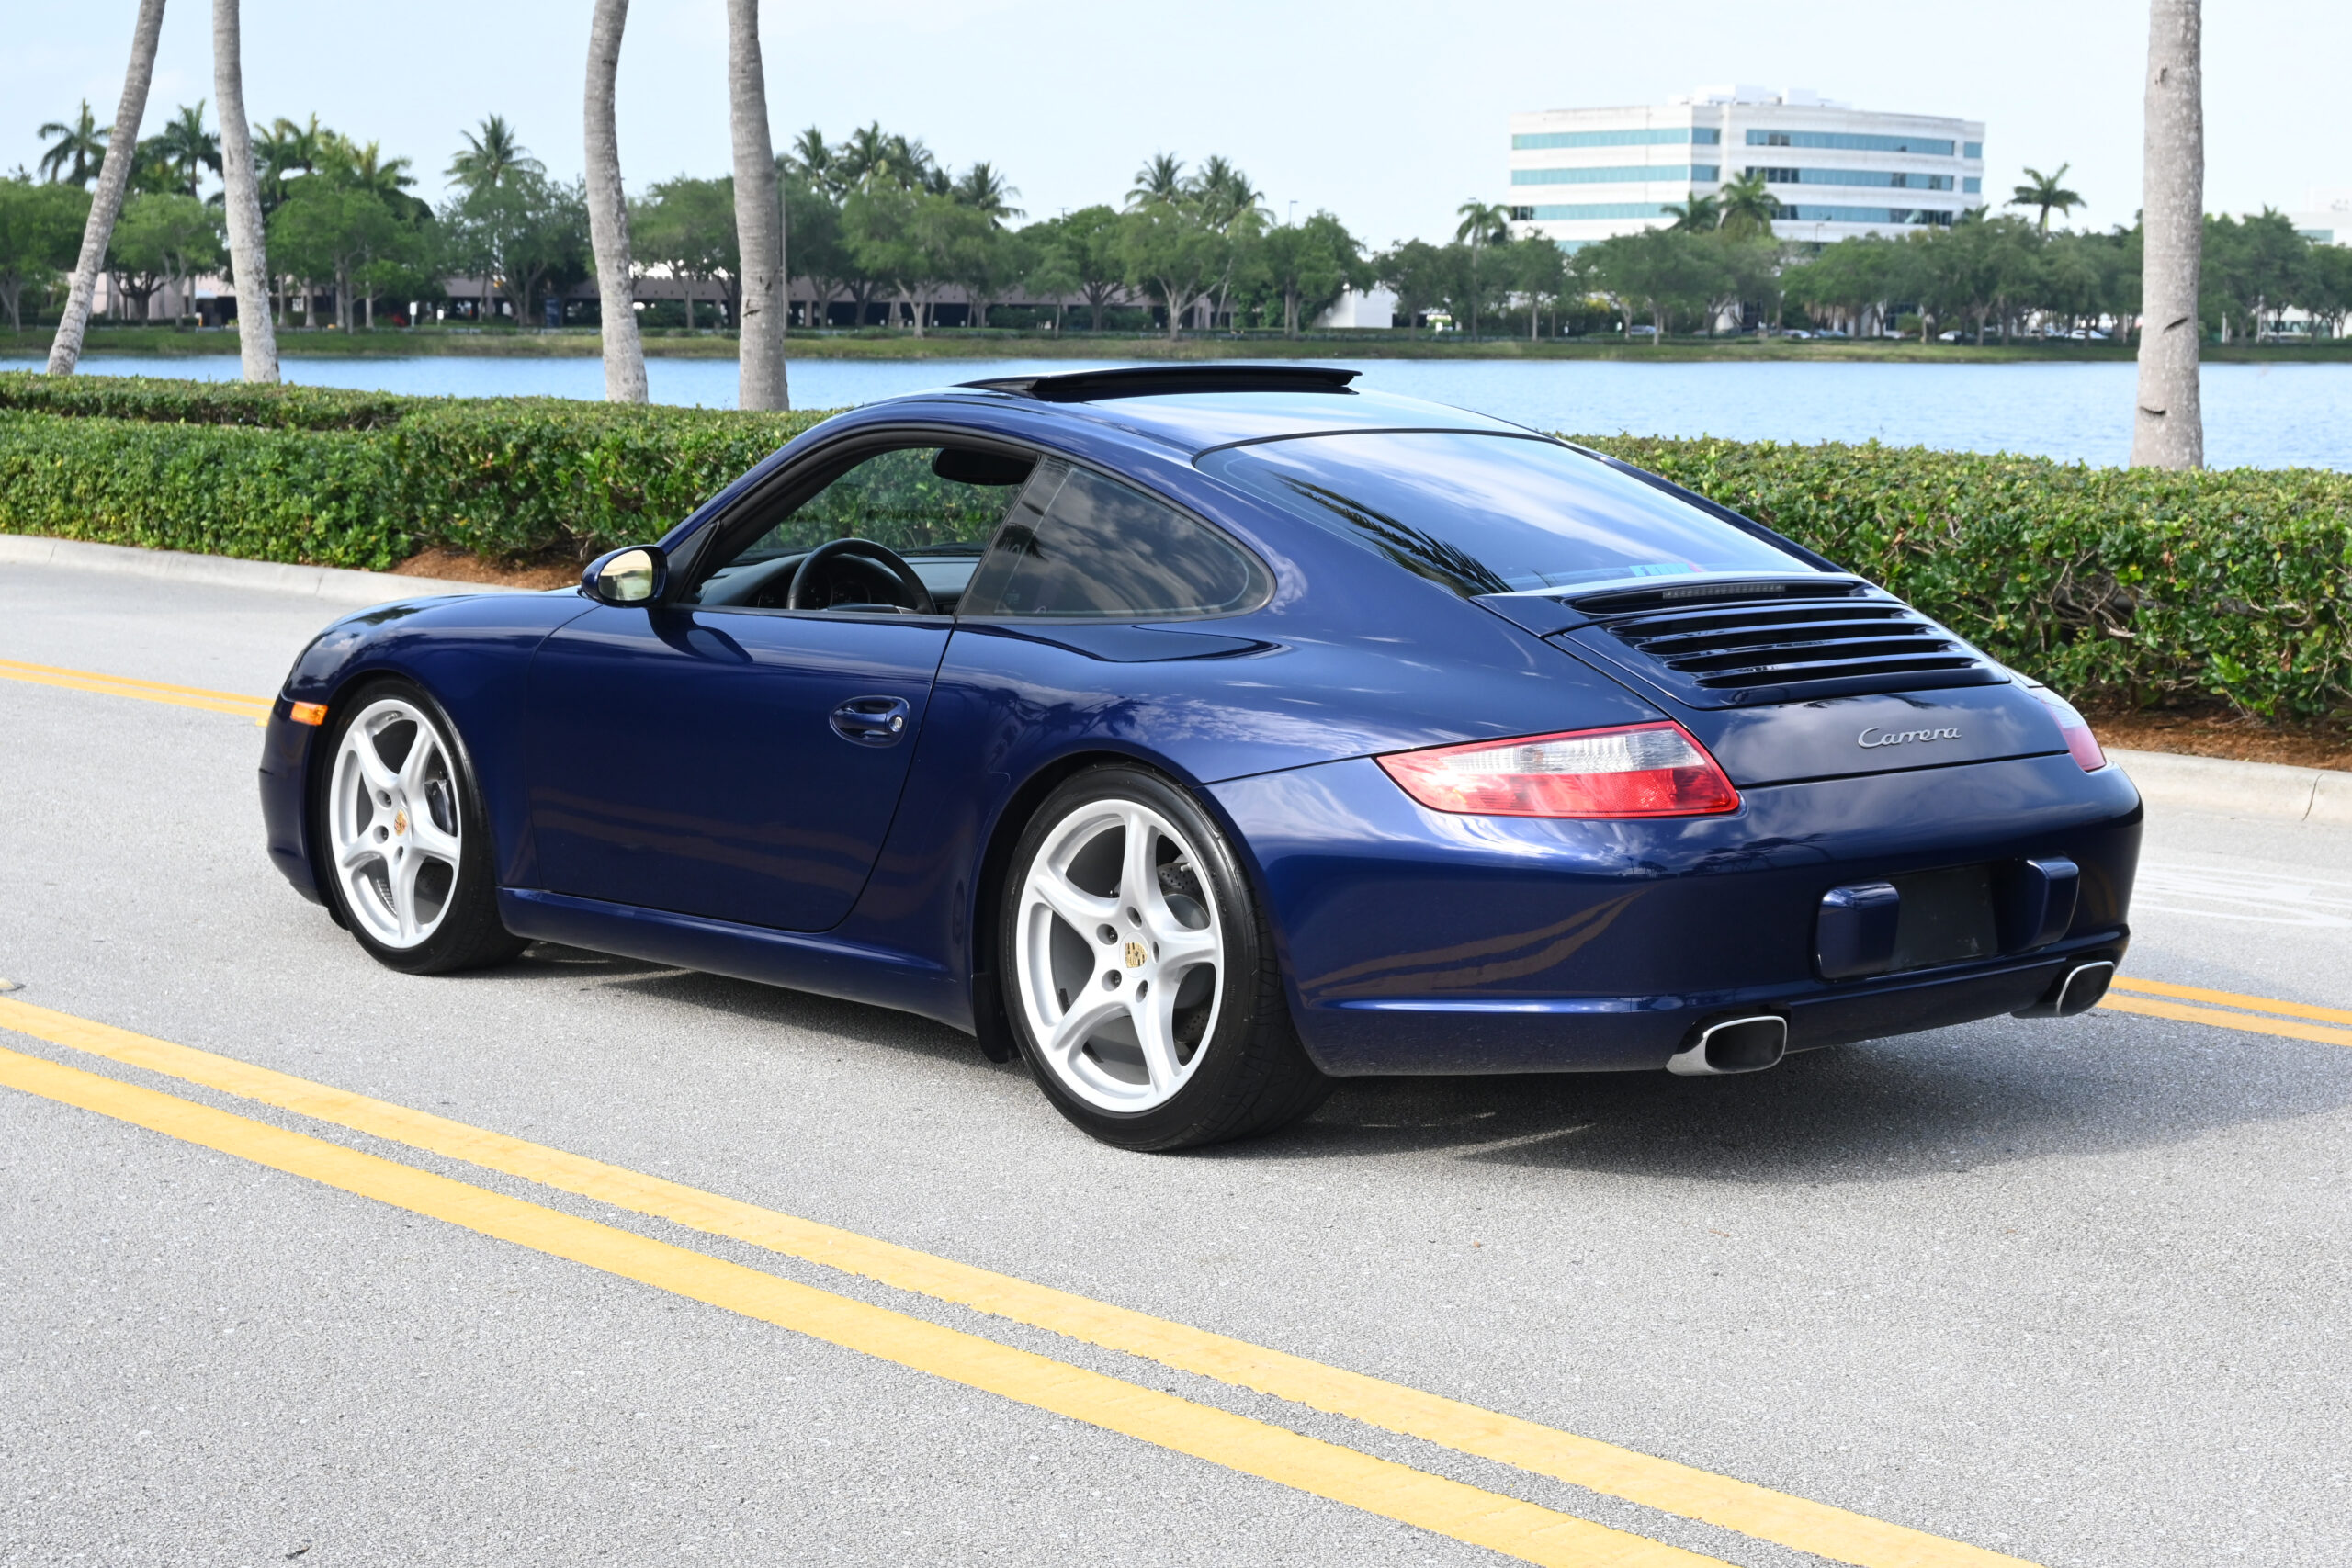 2007 Porsche 997 Carrera, 14K original authentic one owner miles. Florida Car, Service records, fresh inspection